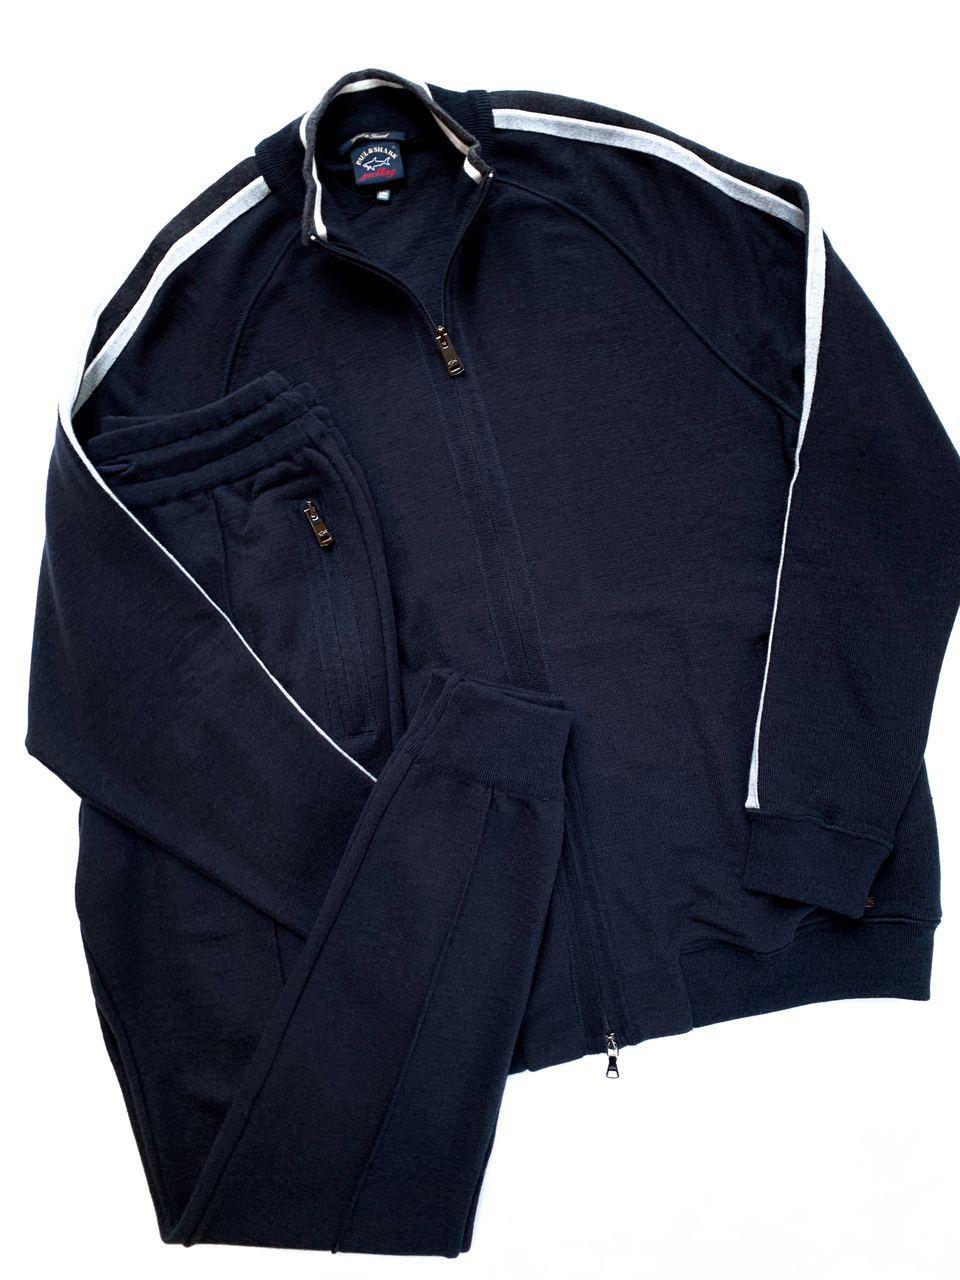 спортивный костюм I20P1243